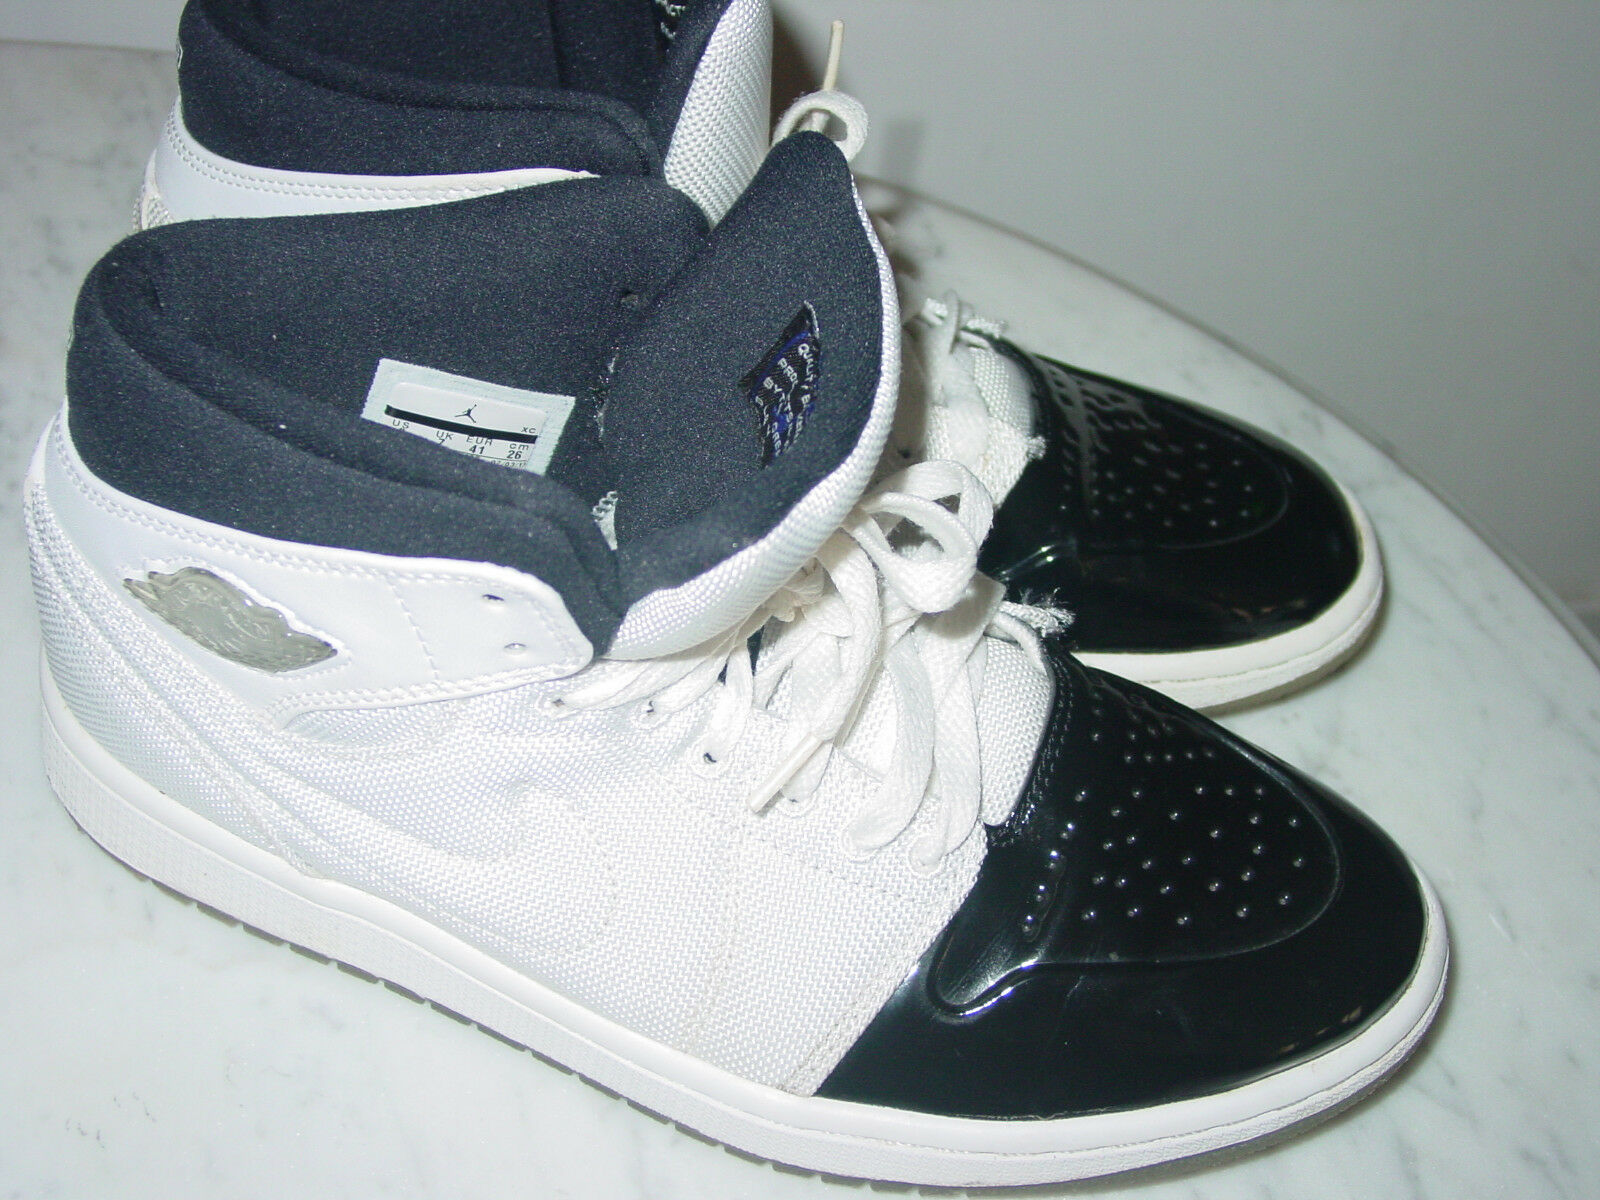 2018 Nike Air Jordan Retro 1 95 TXT Black/Dark Concord Shoes! Size 8 Sold As Is!